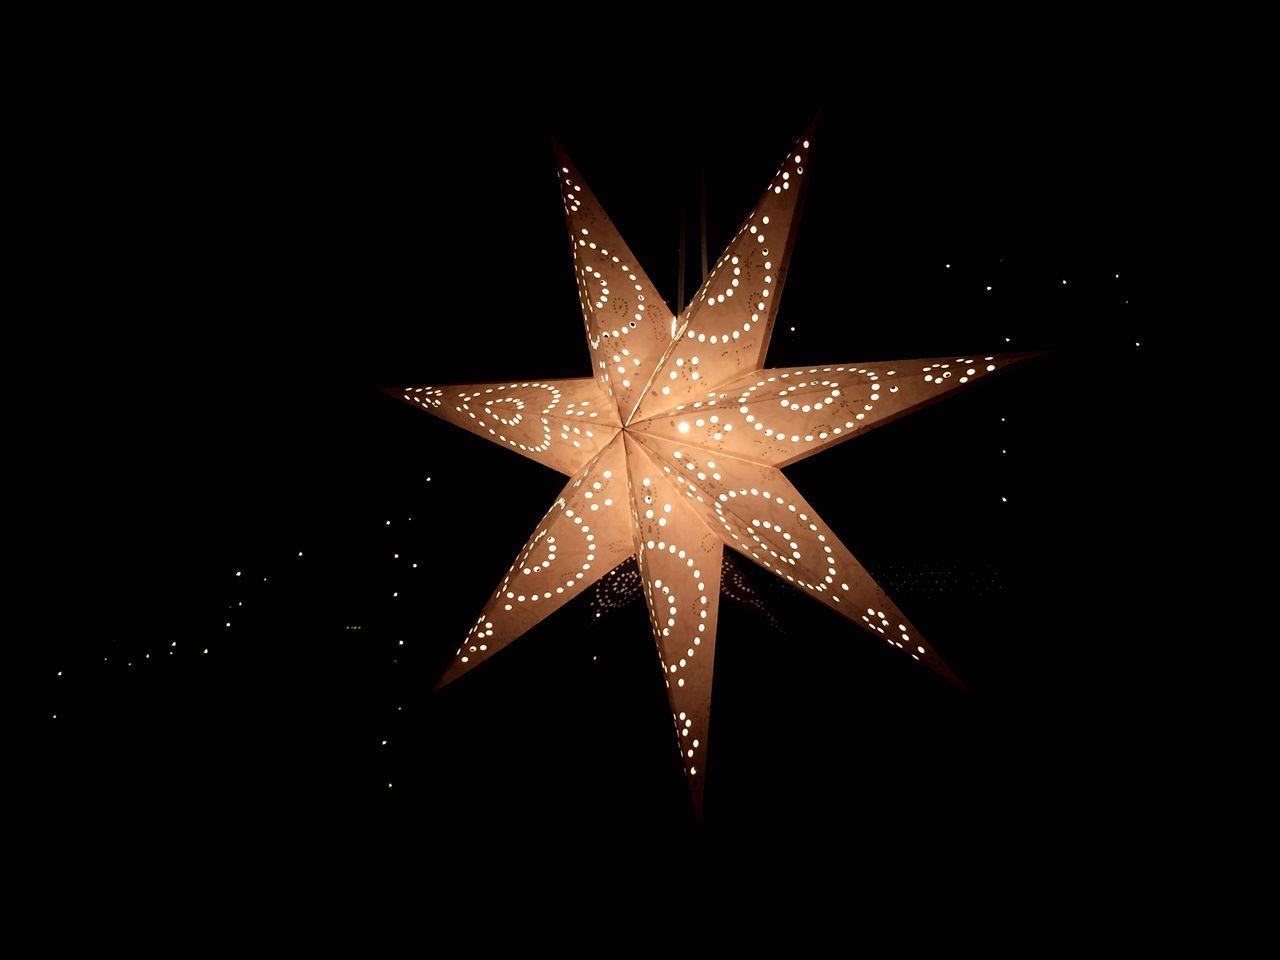 star shape, christmas, christmas decoration, celebration, night, illuminated, tree topper, black background, christmas ornament, no people, christmas lights, close-up, indoors